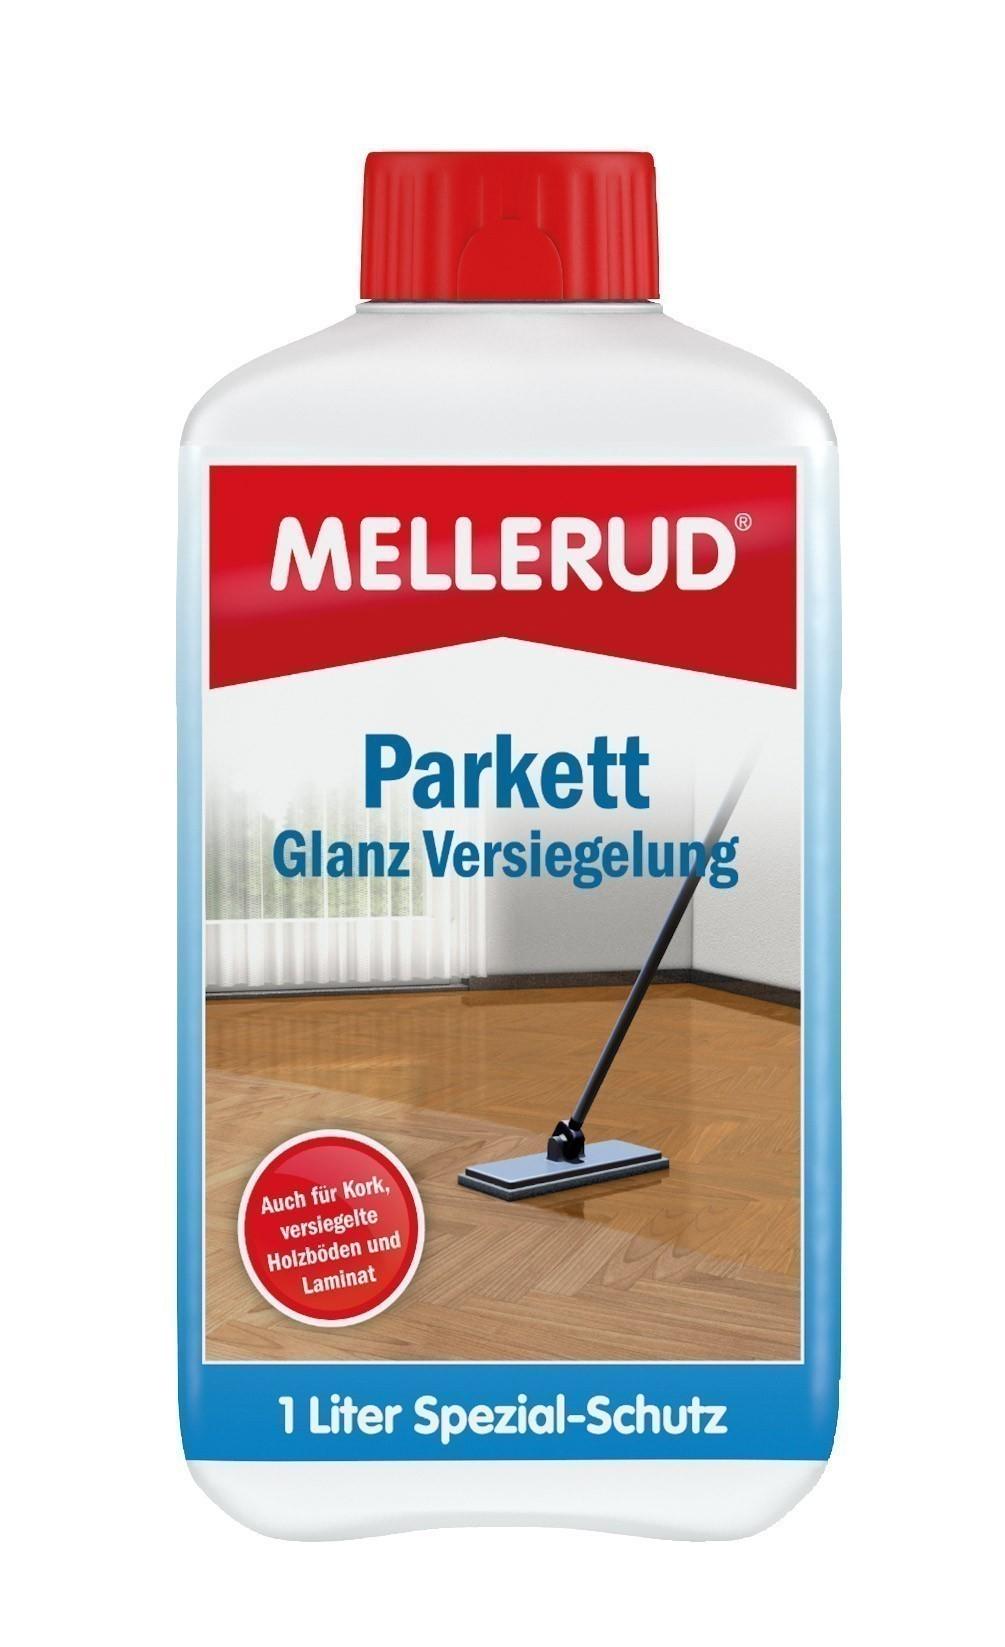 MELLERUD Parkett Glanz Versiegelung 1,0 Liter Bild 1